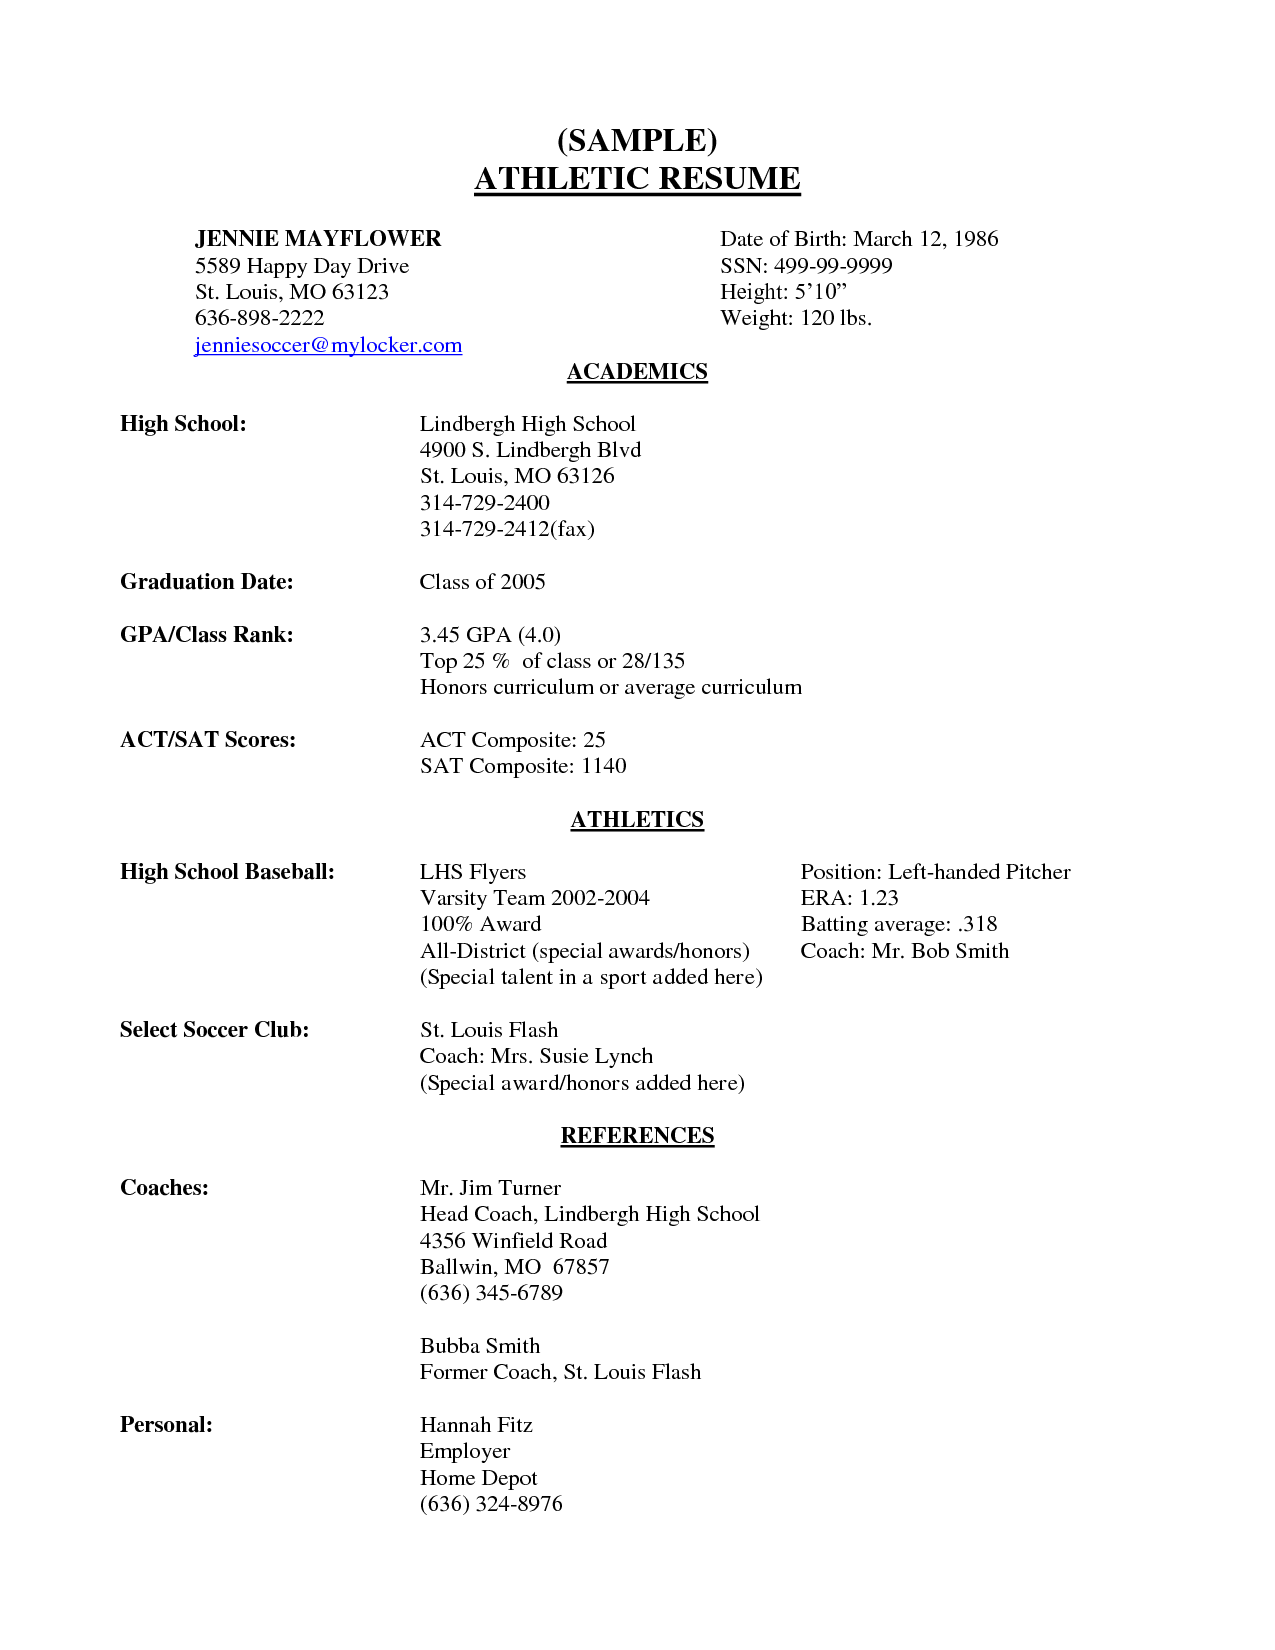 High School Senior Resume Sample  scope of work template